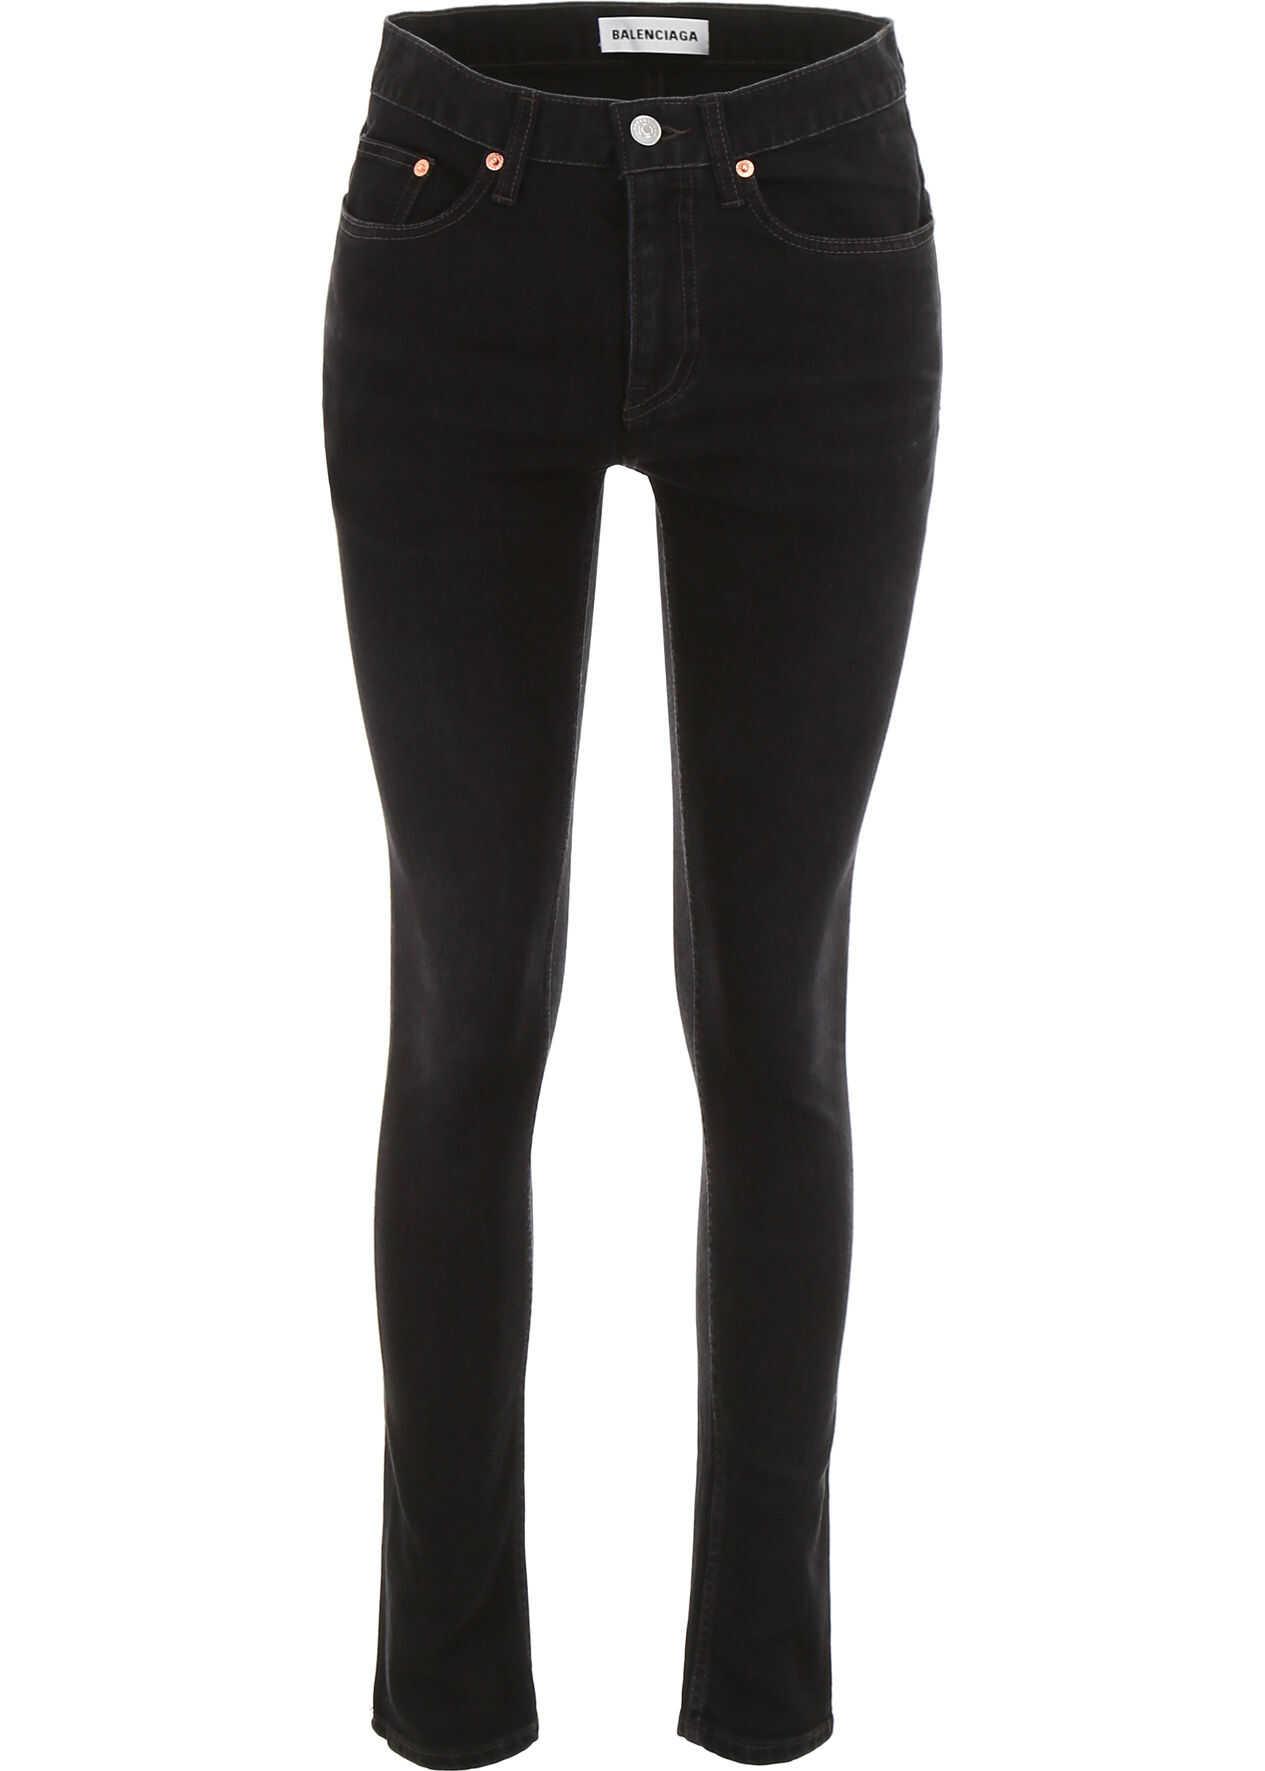 Balenciaga Skinny Jeans WASHED BLACK